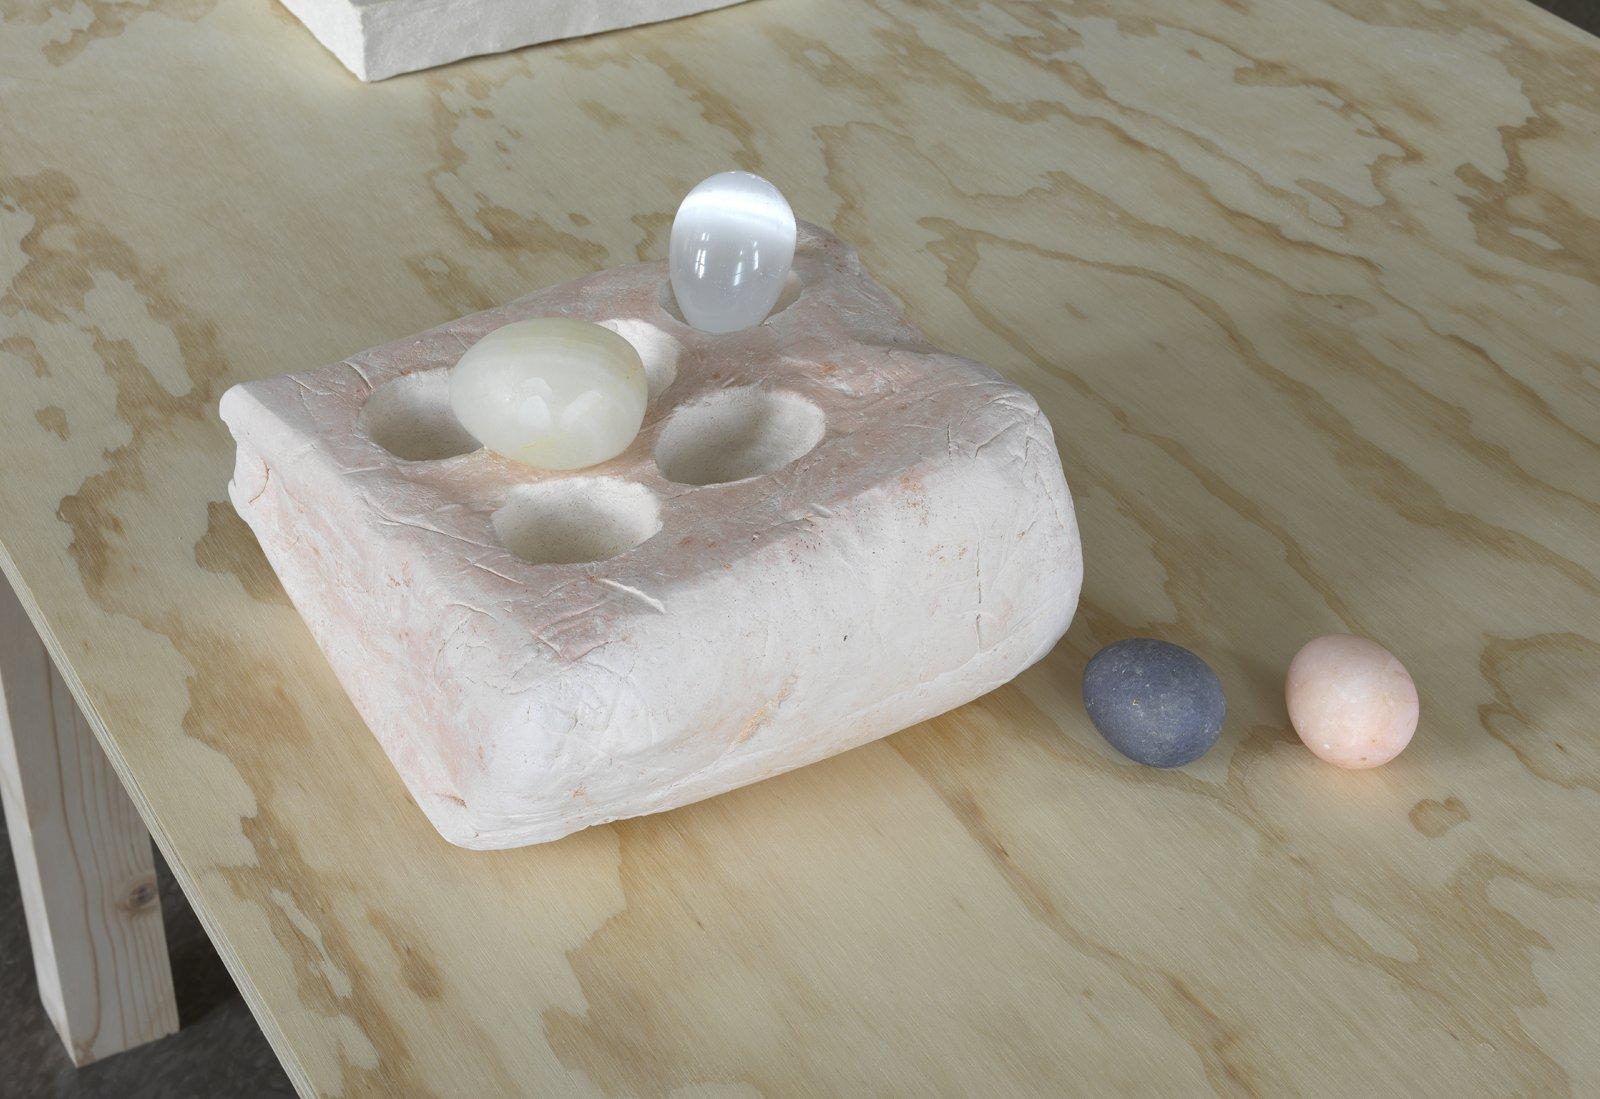 Christina Mackie, Palette no. 1, 2014, stoneware, rose quartz, selenite, alabaster onyx, 10 x 8 x 6 in. (25 x 20 x 14 cm) by Christina Mackie